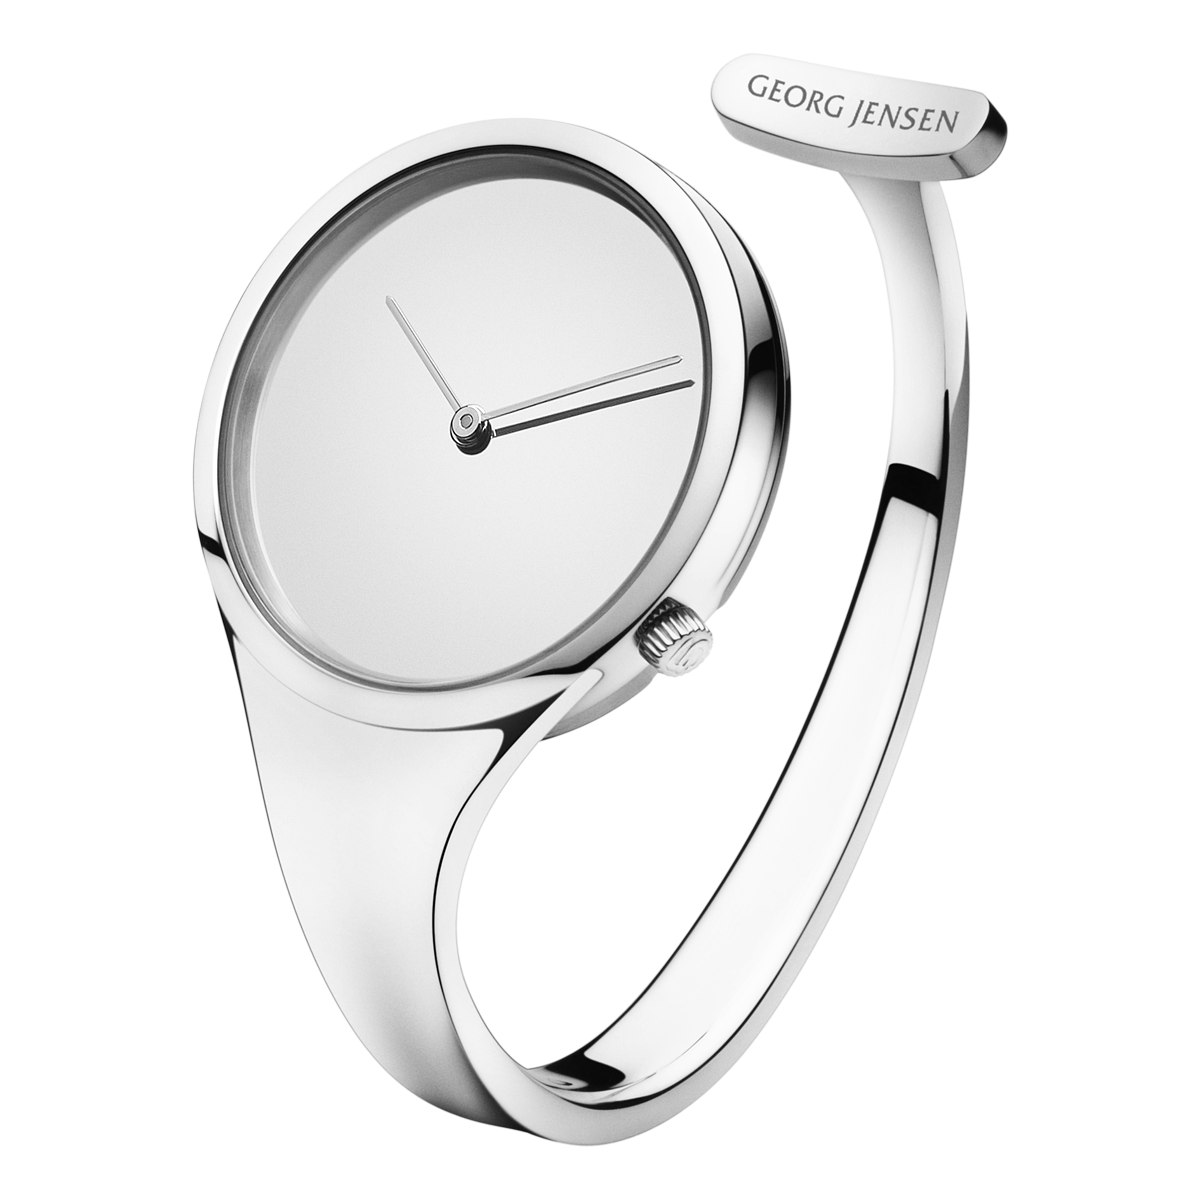 Georg Jensen Vivianna Diamond Bangle 326 Large Dial Created By The Legendary Swedish Designer Torun Bülow Hübe